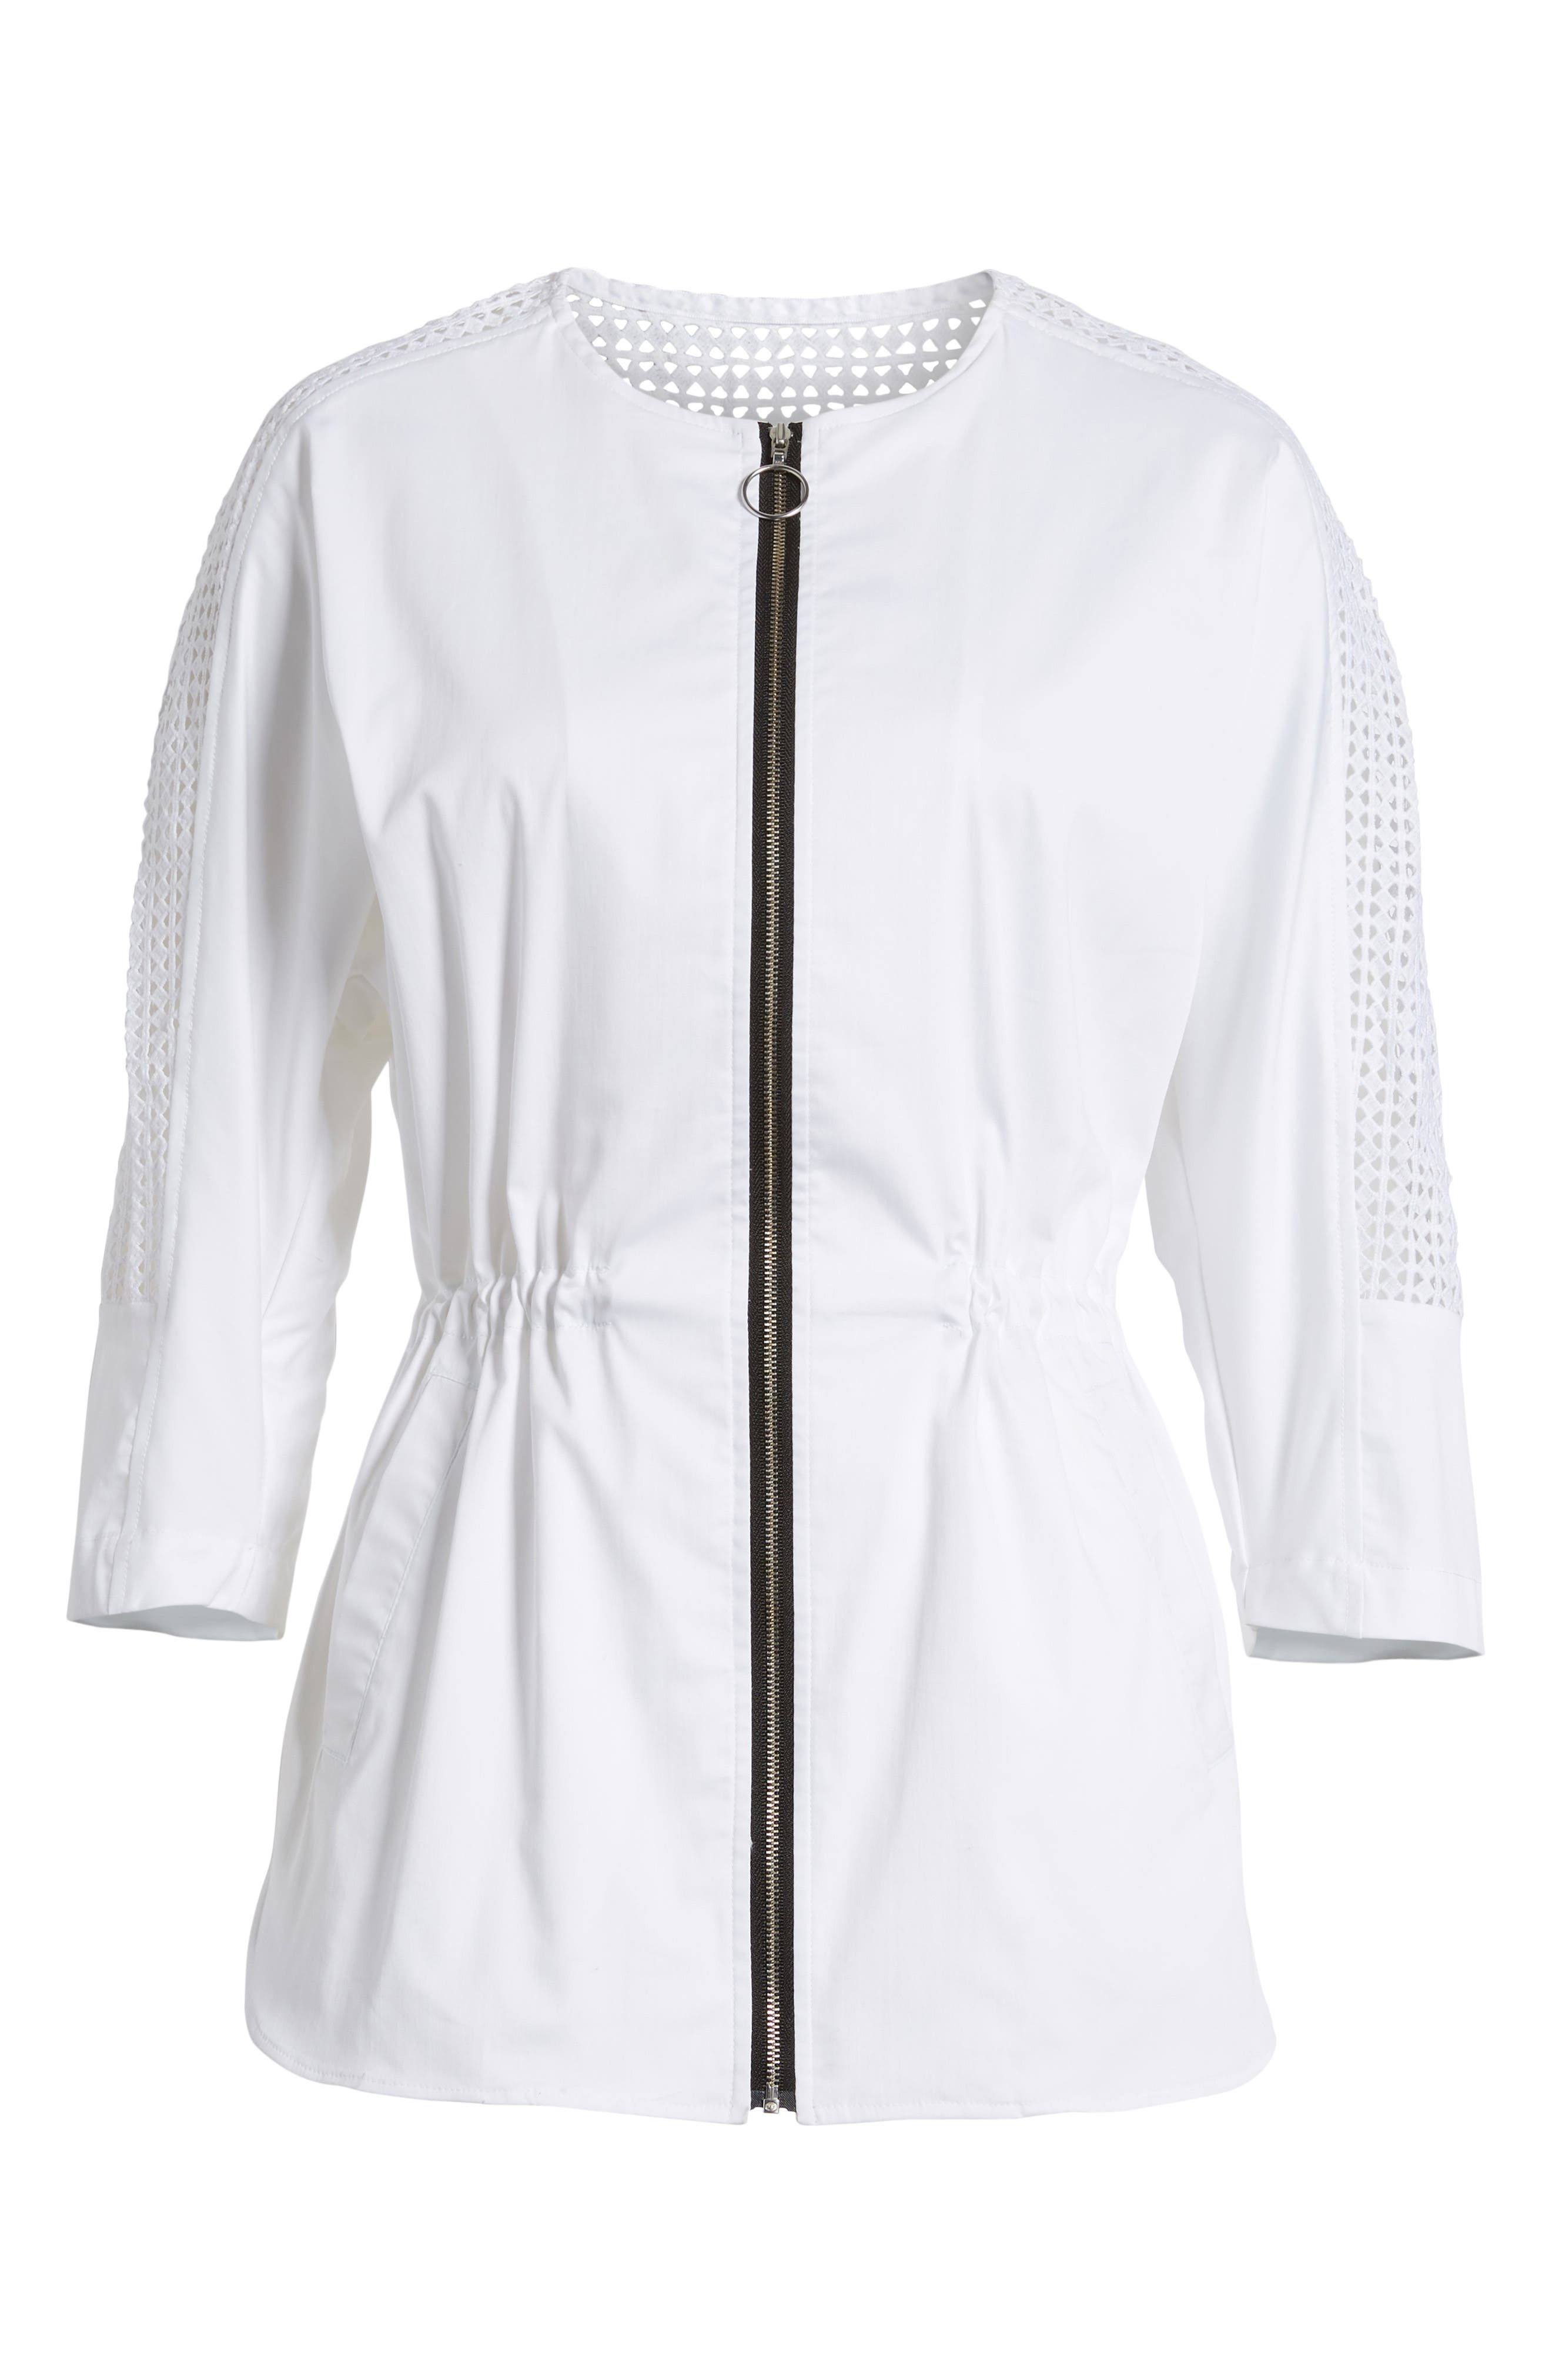 Eyelet Sleeve Front Zip Jacket,                             Alternate thumbnail 5, color,                             WHITE/ BLACK